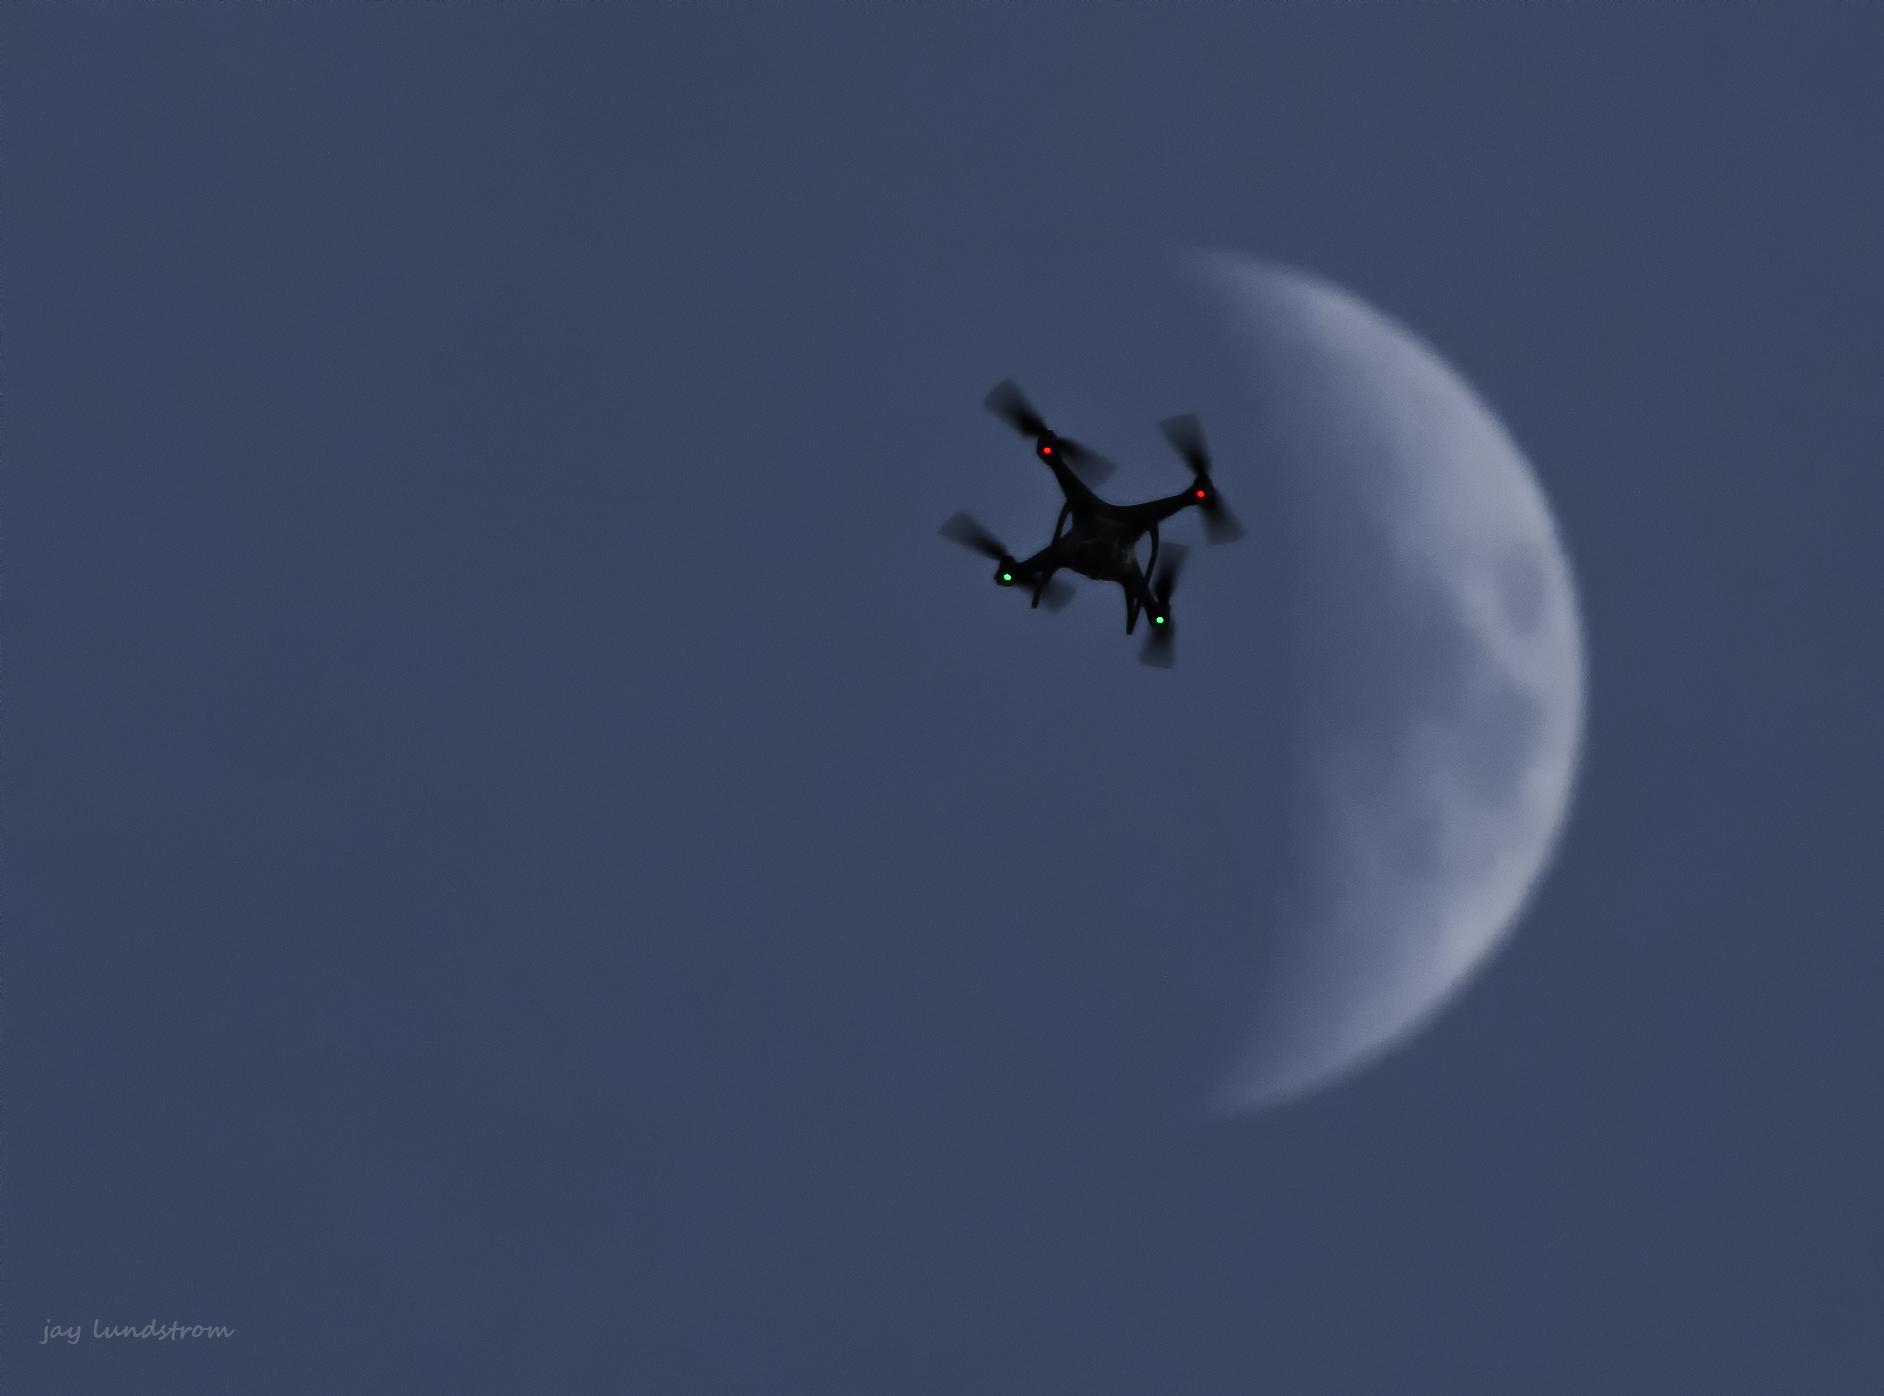 2018-02-21 Drone_Moon 007.jpg